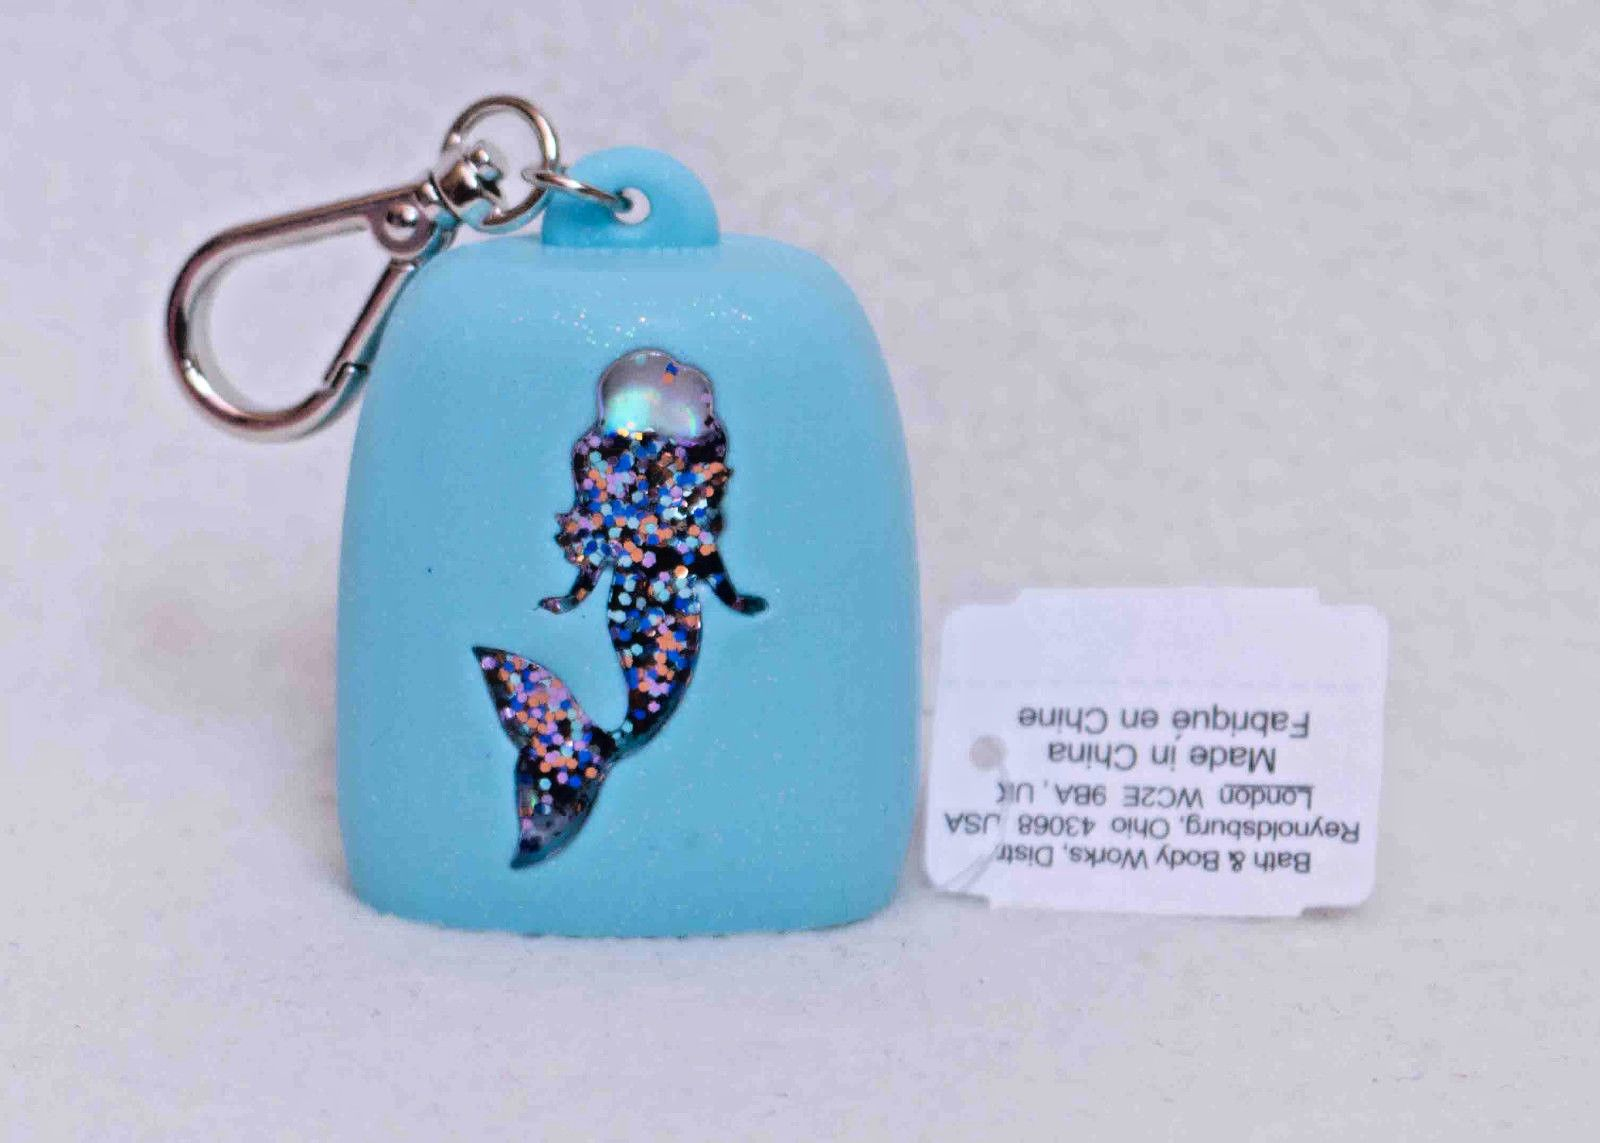 Mermaid Tail Pocketbac Holder Bath Body Works Up Your